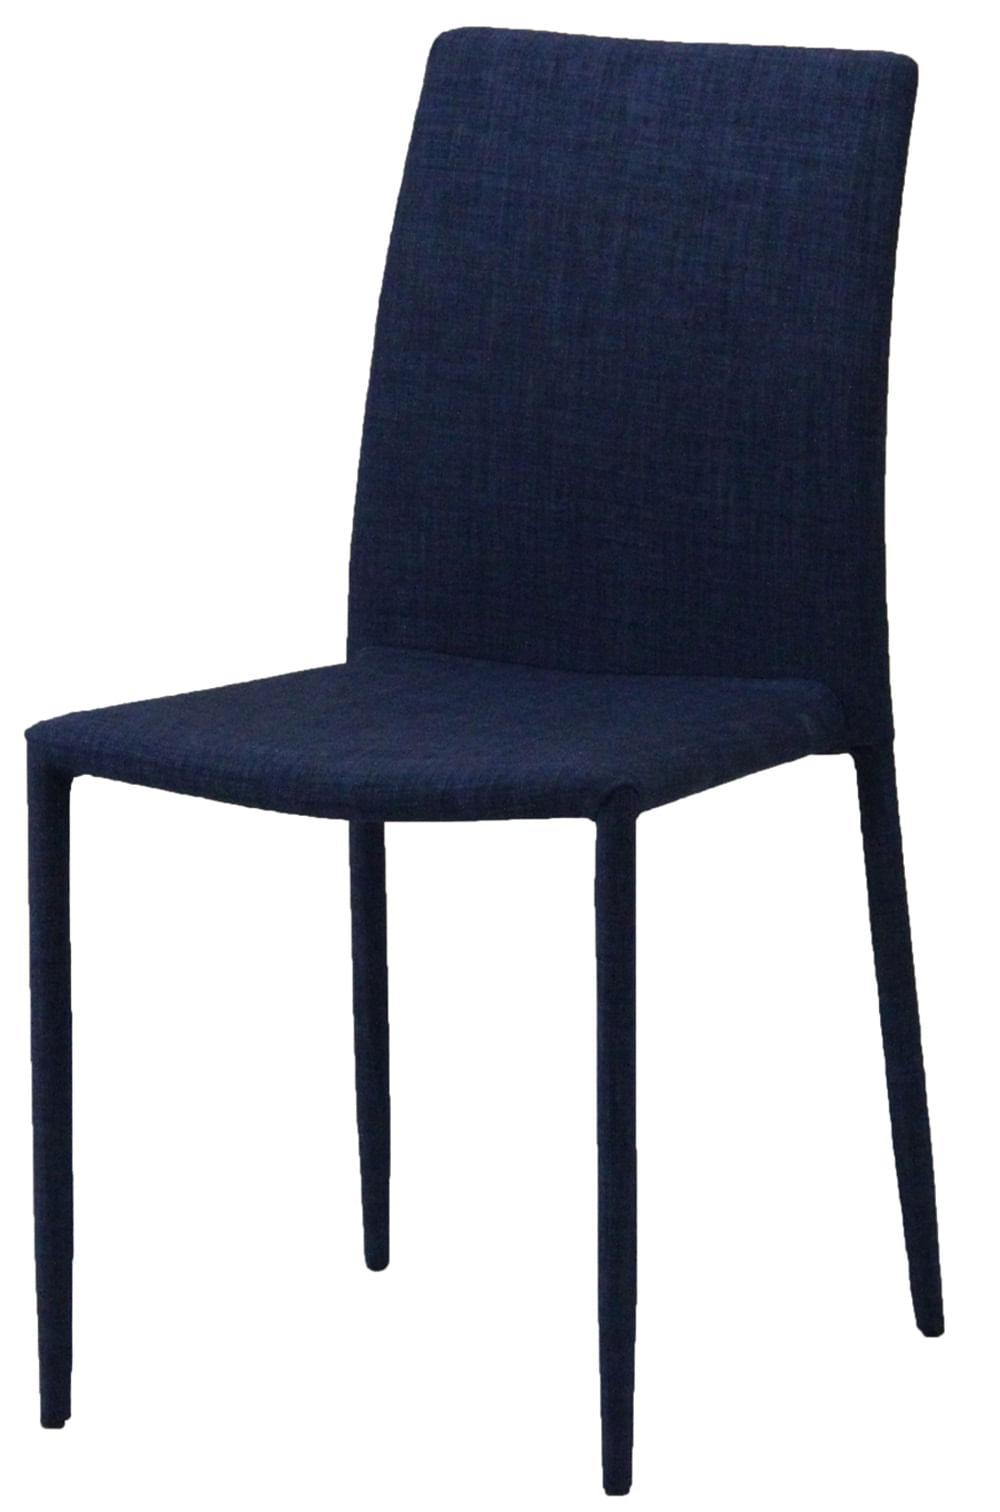 Cadeira Indonesia Estofada Tecido Sintetico Azul - 30743